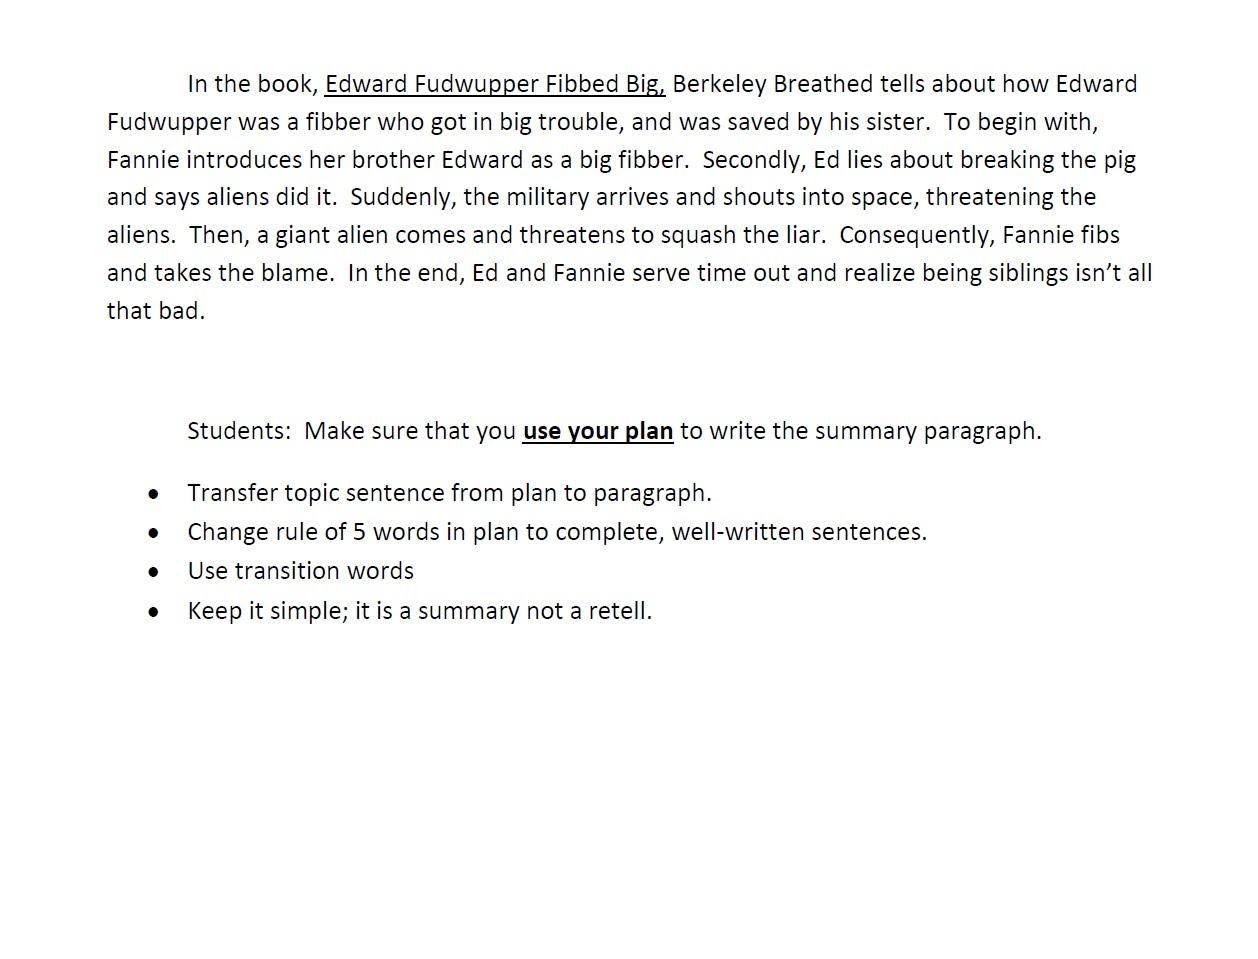 Sample Summary Paragraph